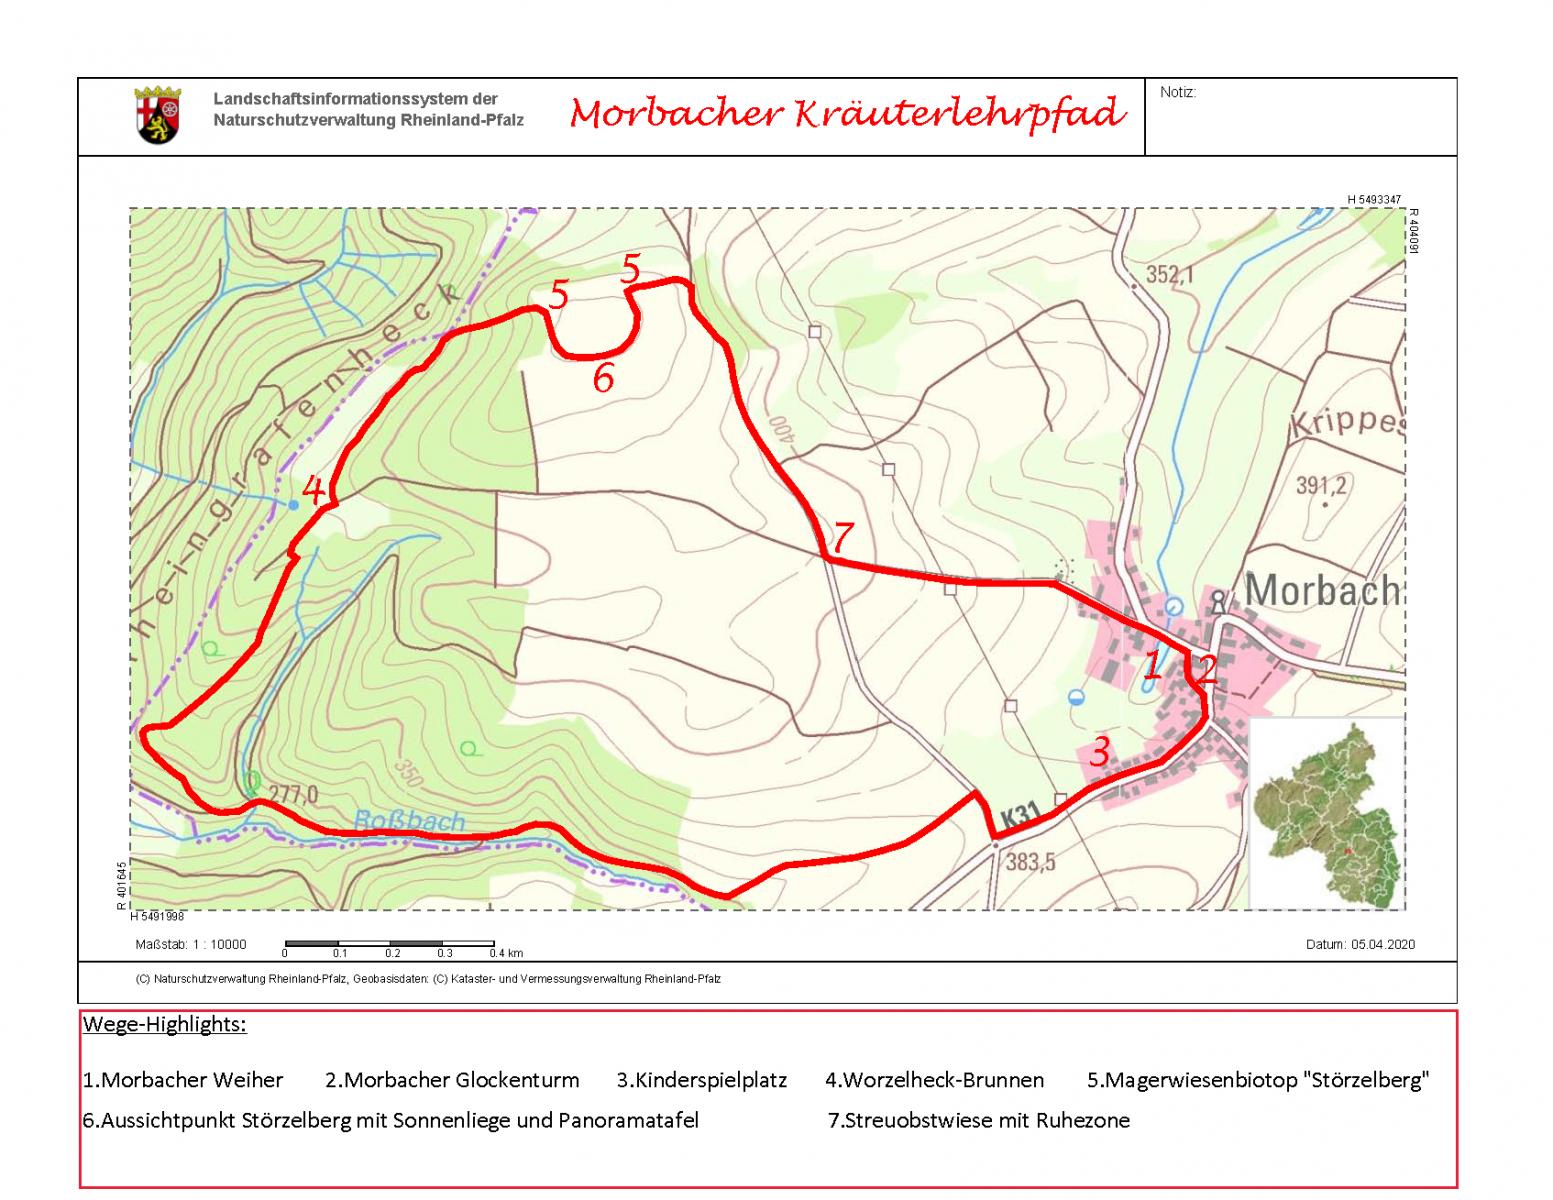 Lehrpfad_Morbach